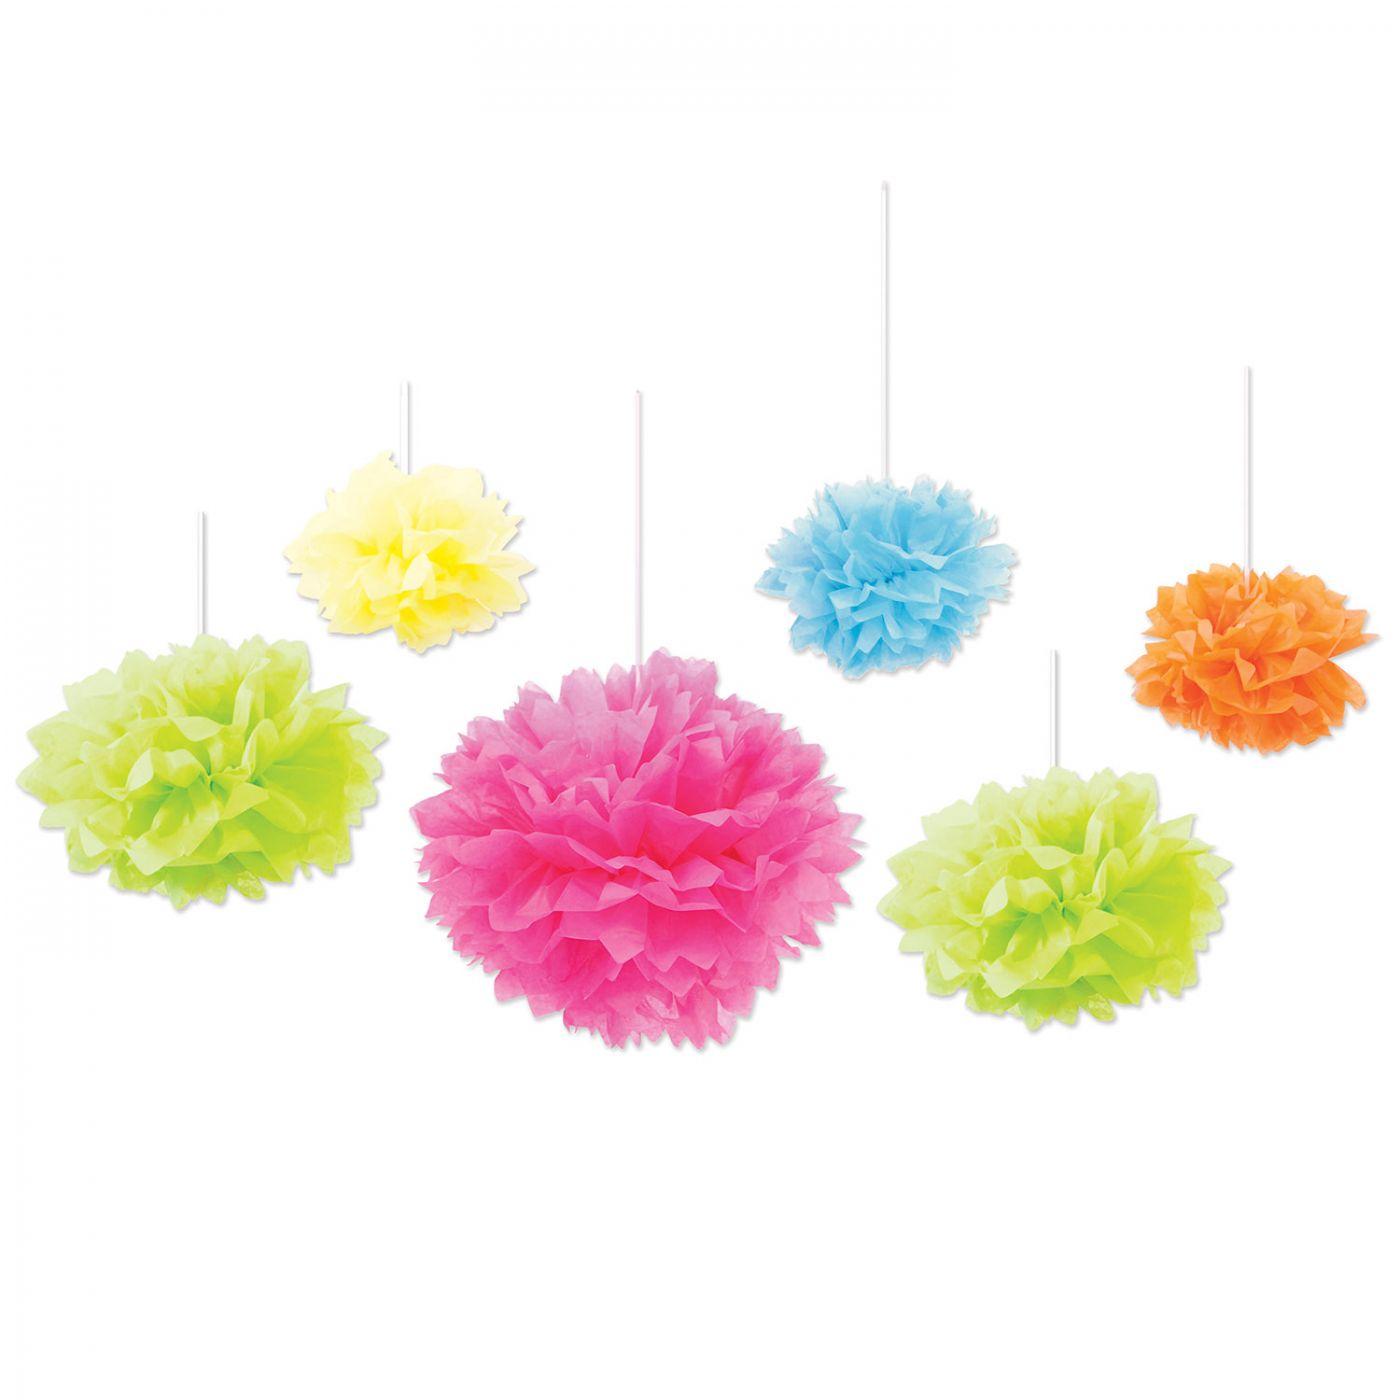 Tissue Fluff Balls (6) image